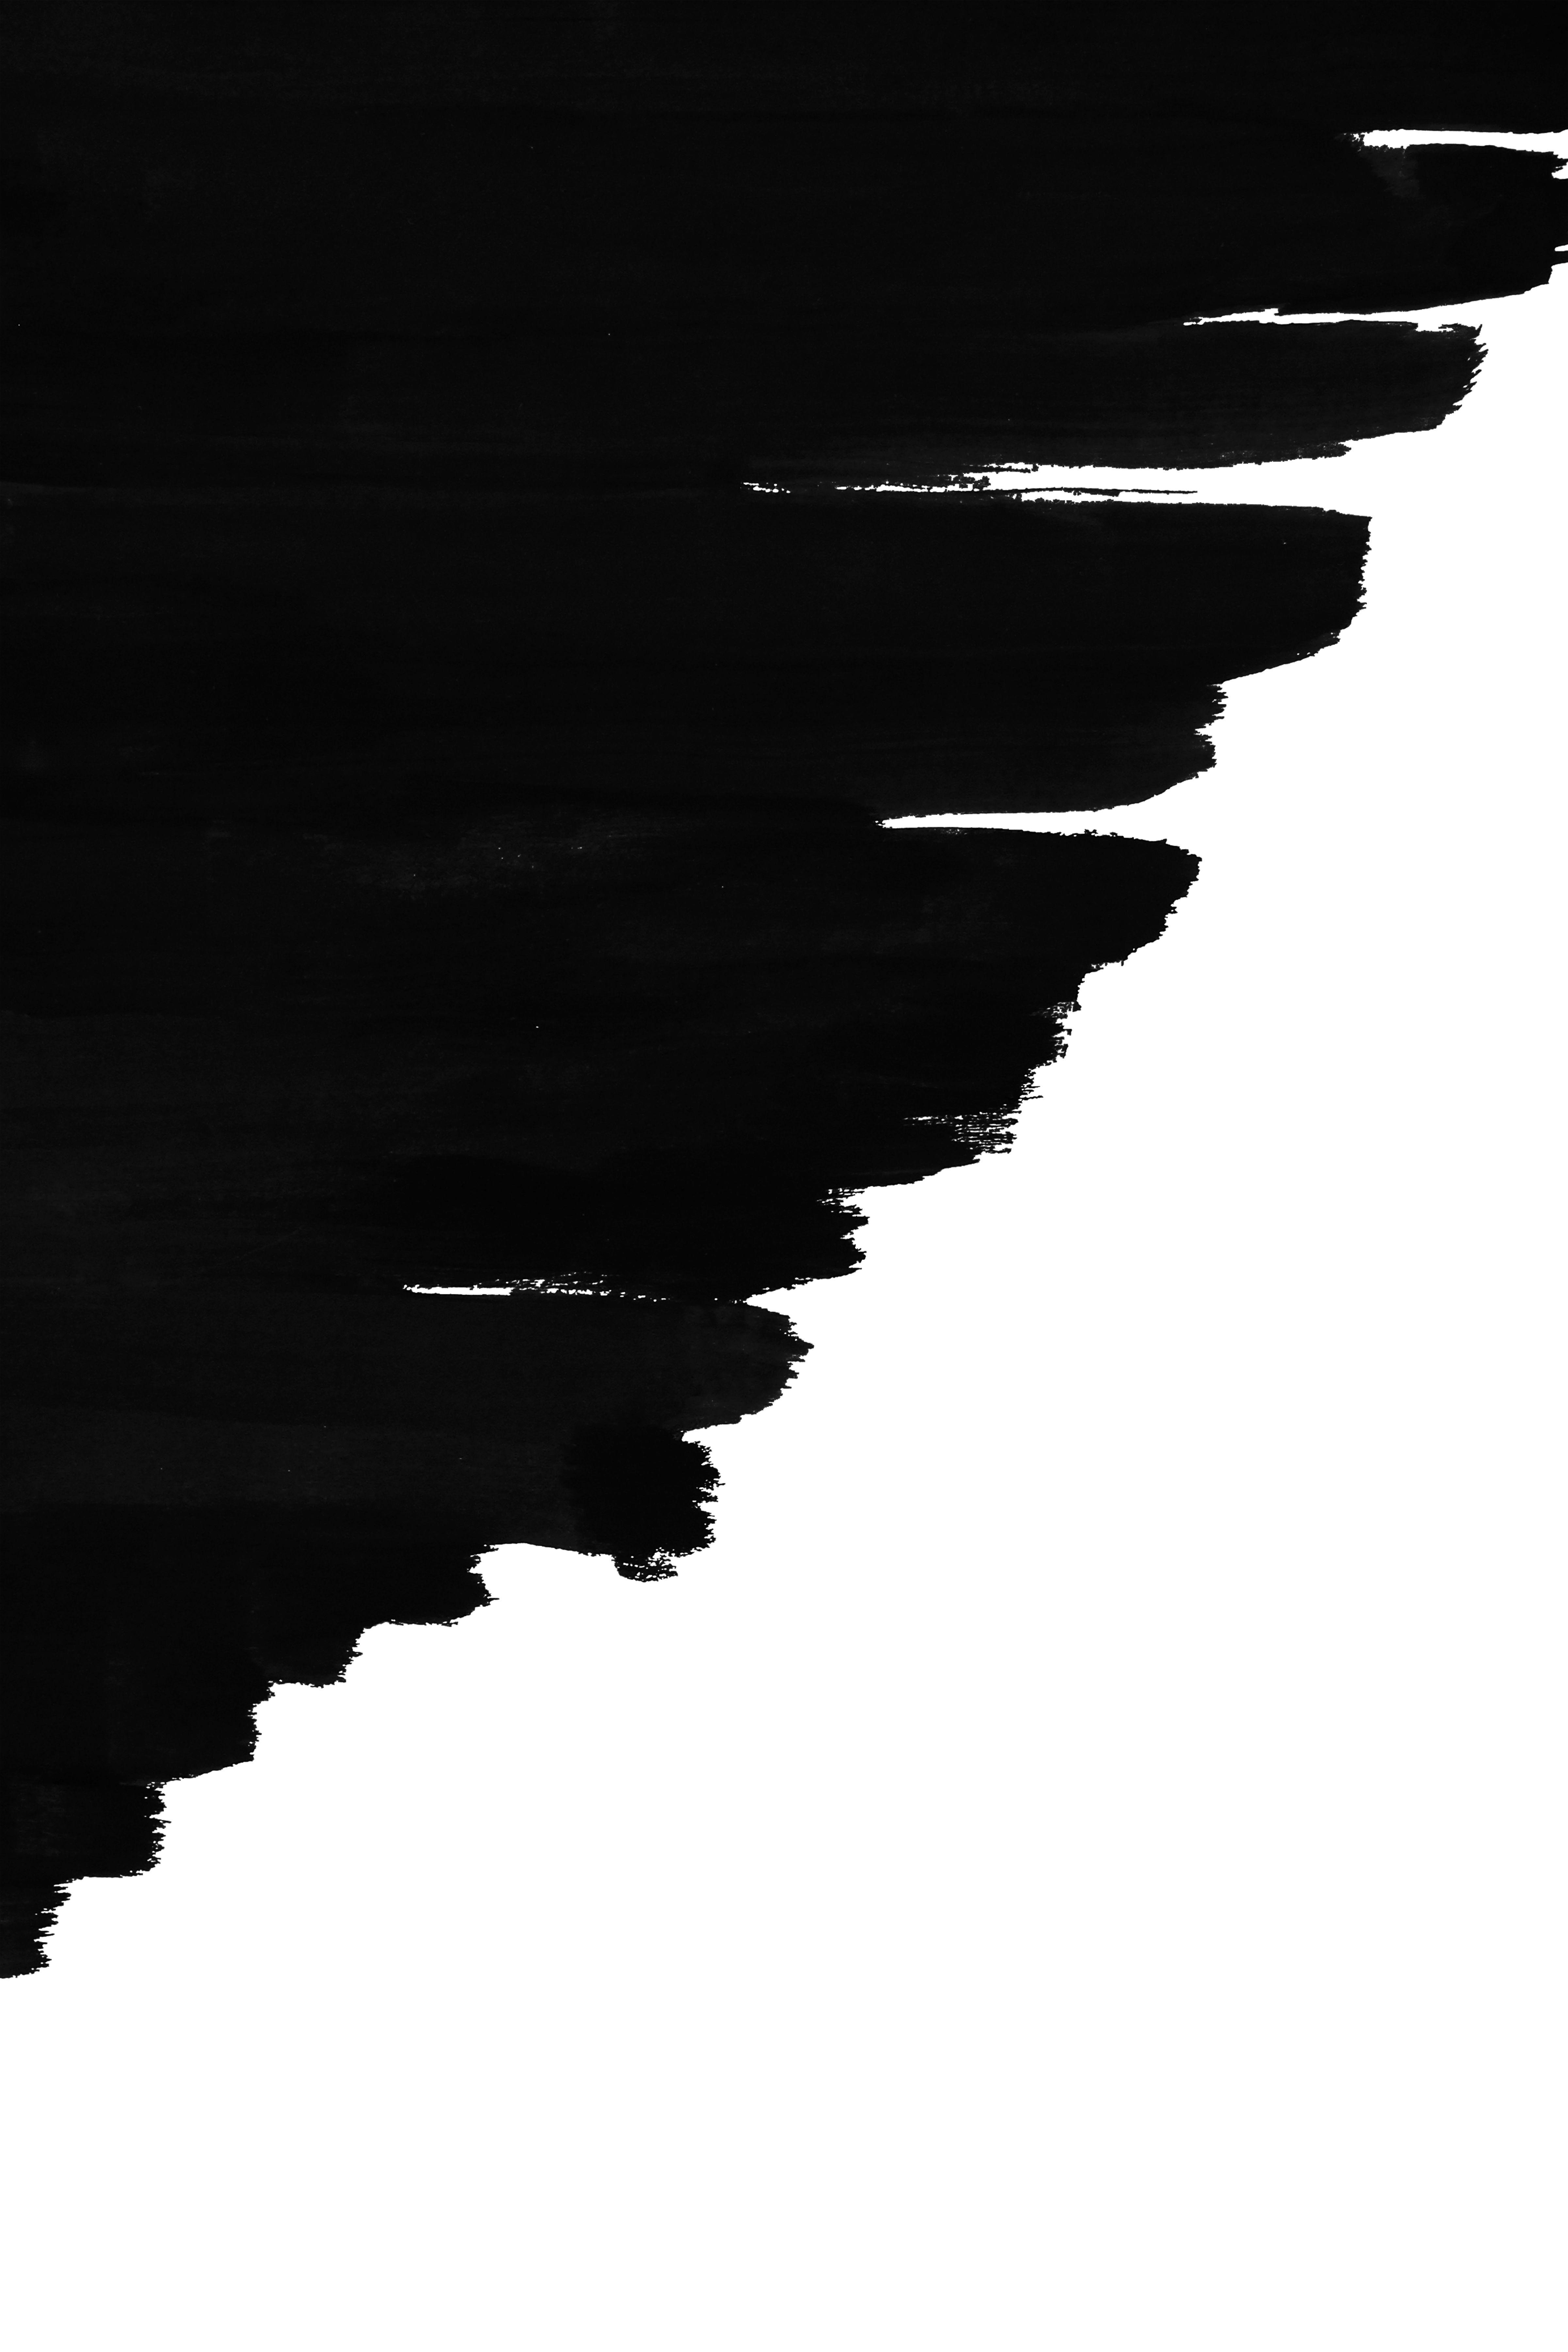 Black Minimalist Poster Print Artprint Handmade Acrylic Paint